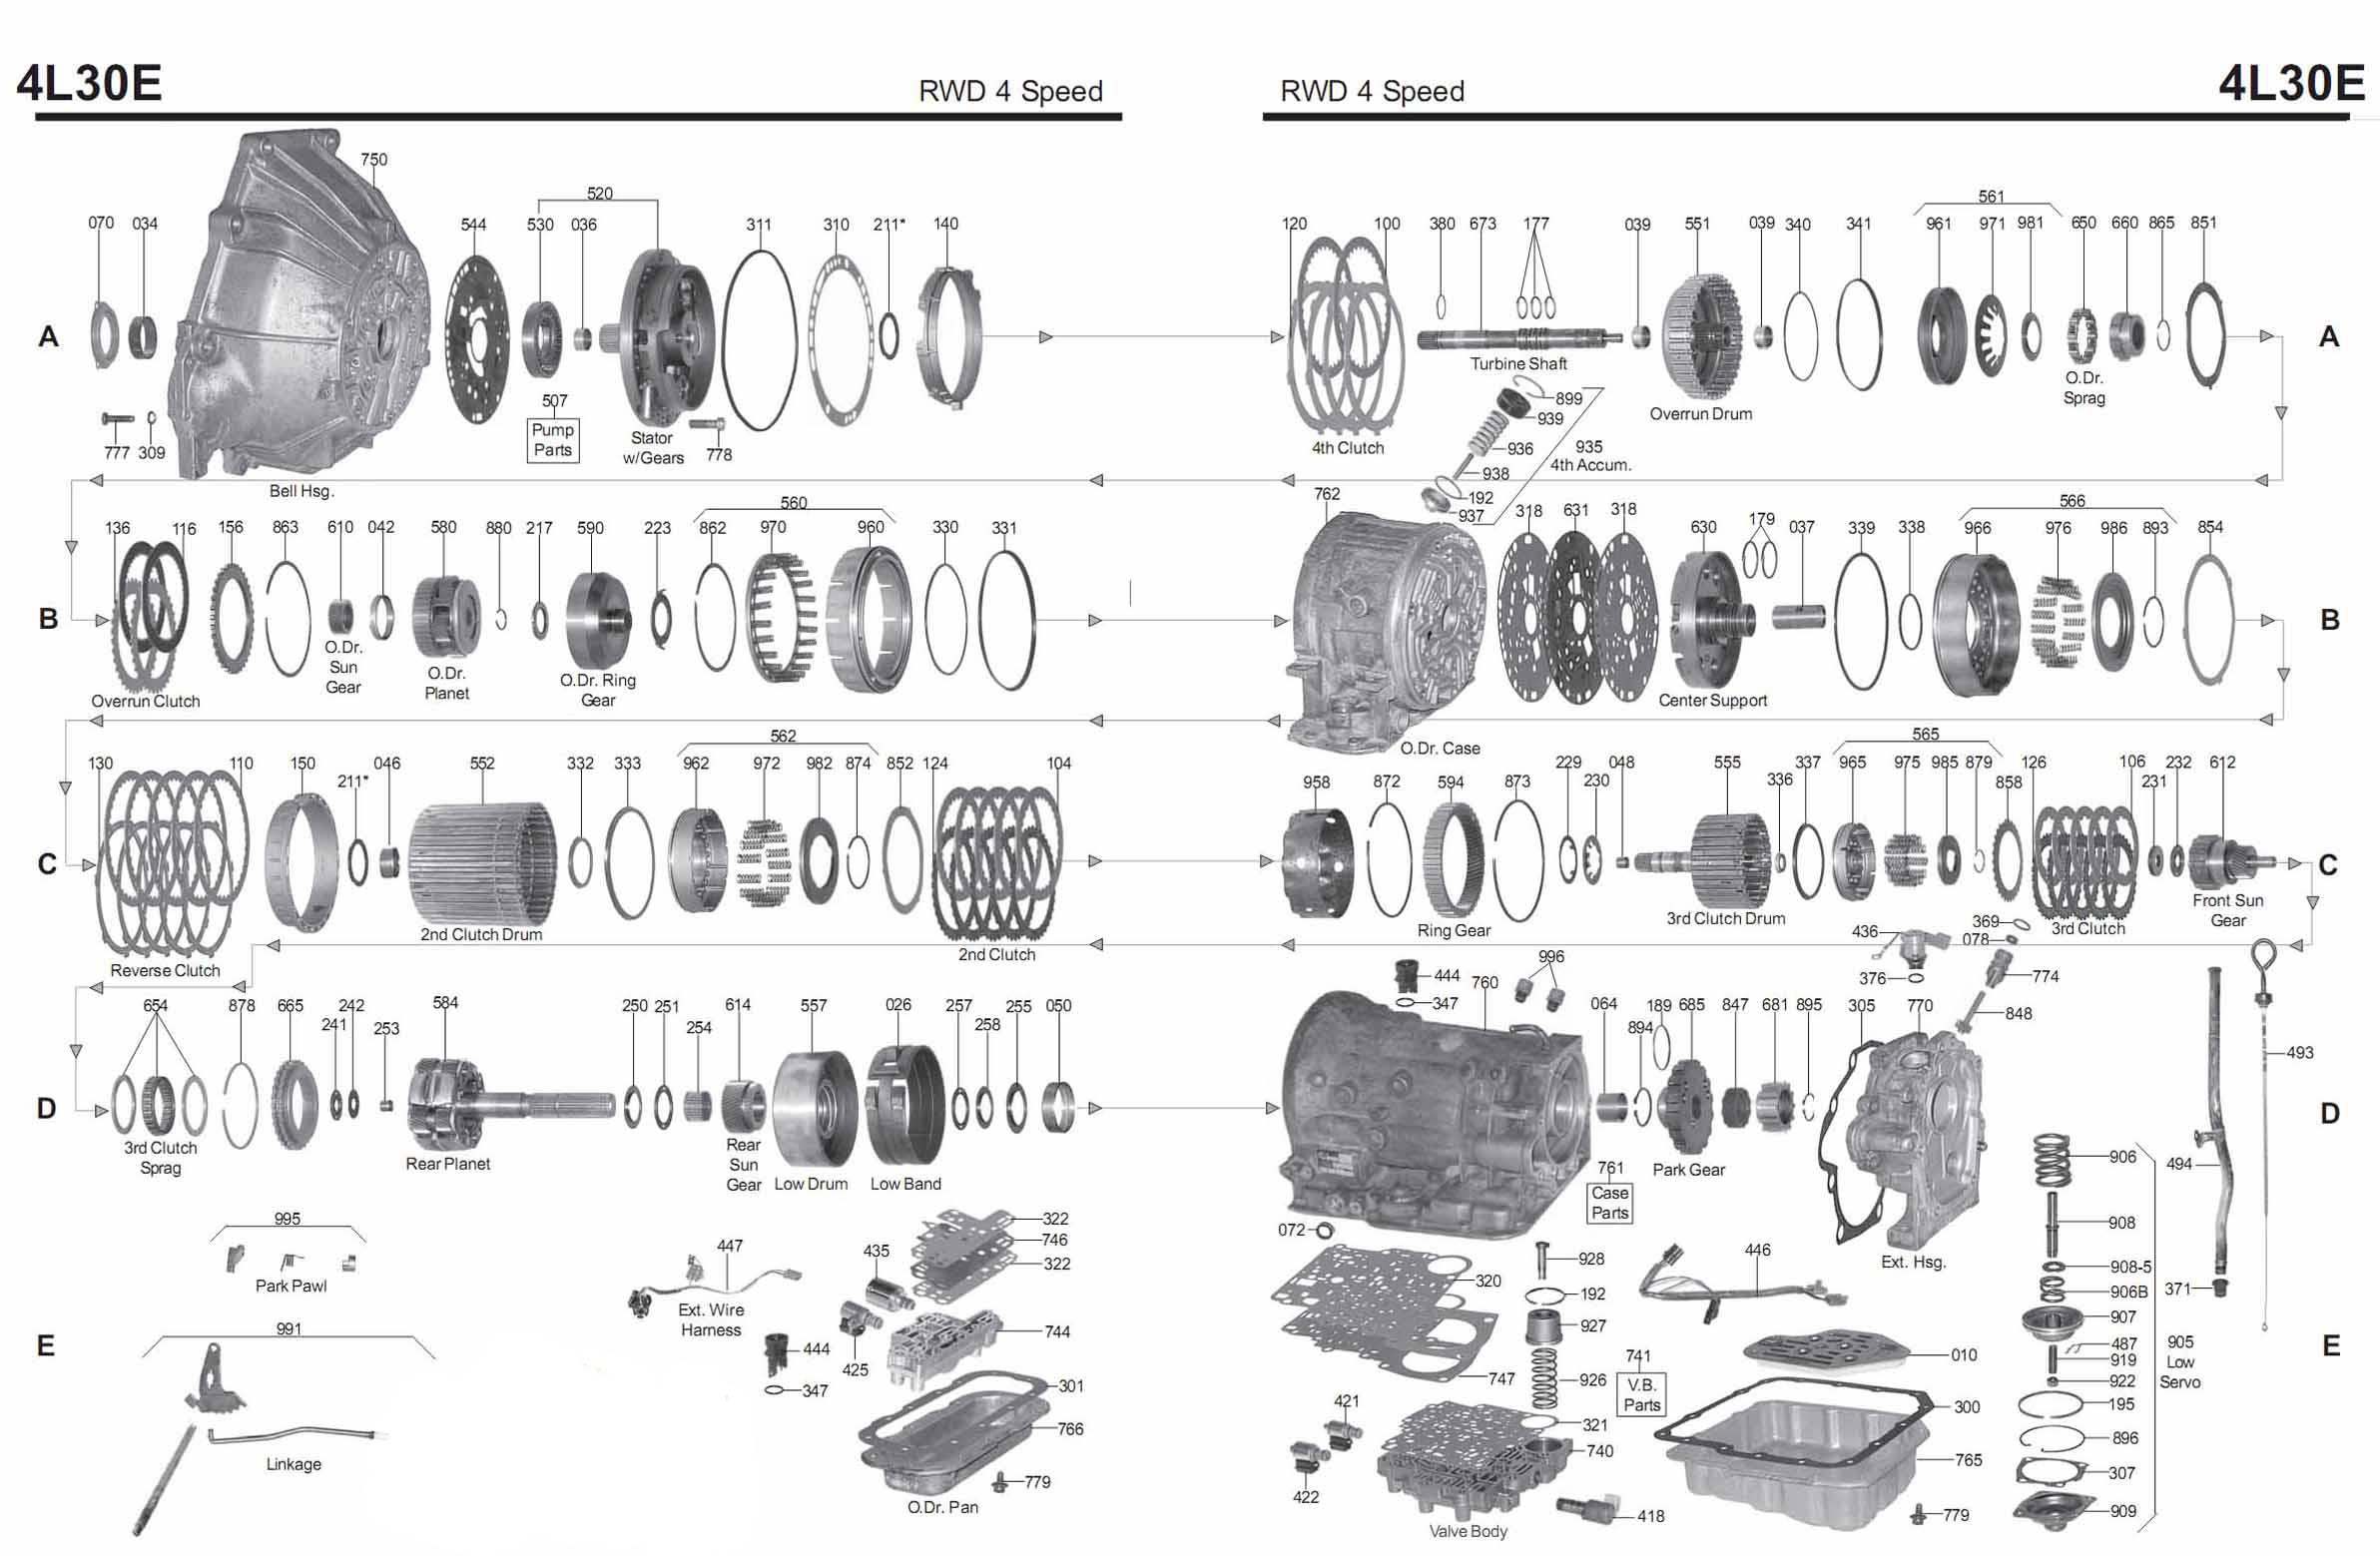 4l30e Transmission Diagram Data Circuit Writer Pensilverbased5grepairs Traces Repair Manuals Instructions For Rebuild Rh At Com Shift Solenoid Location Wiring